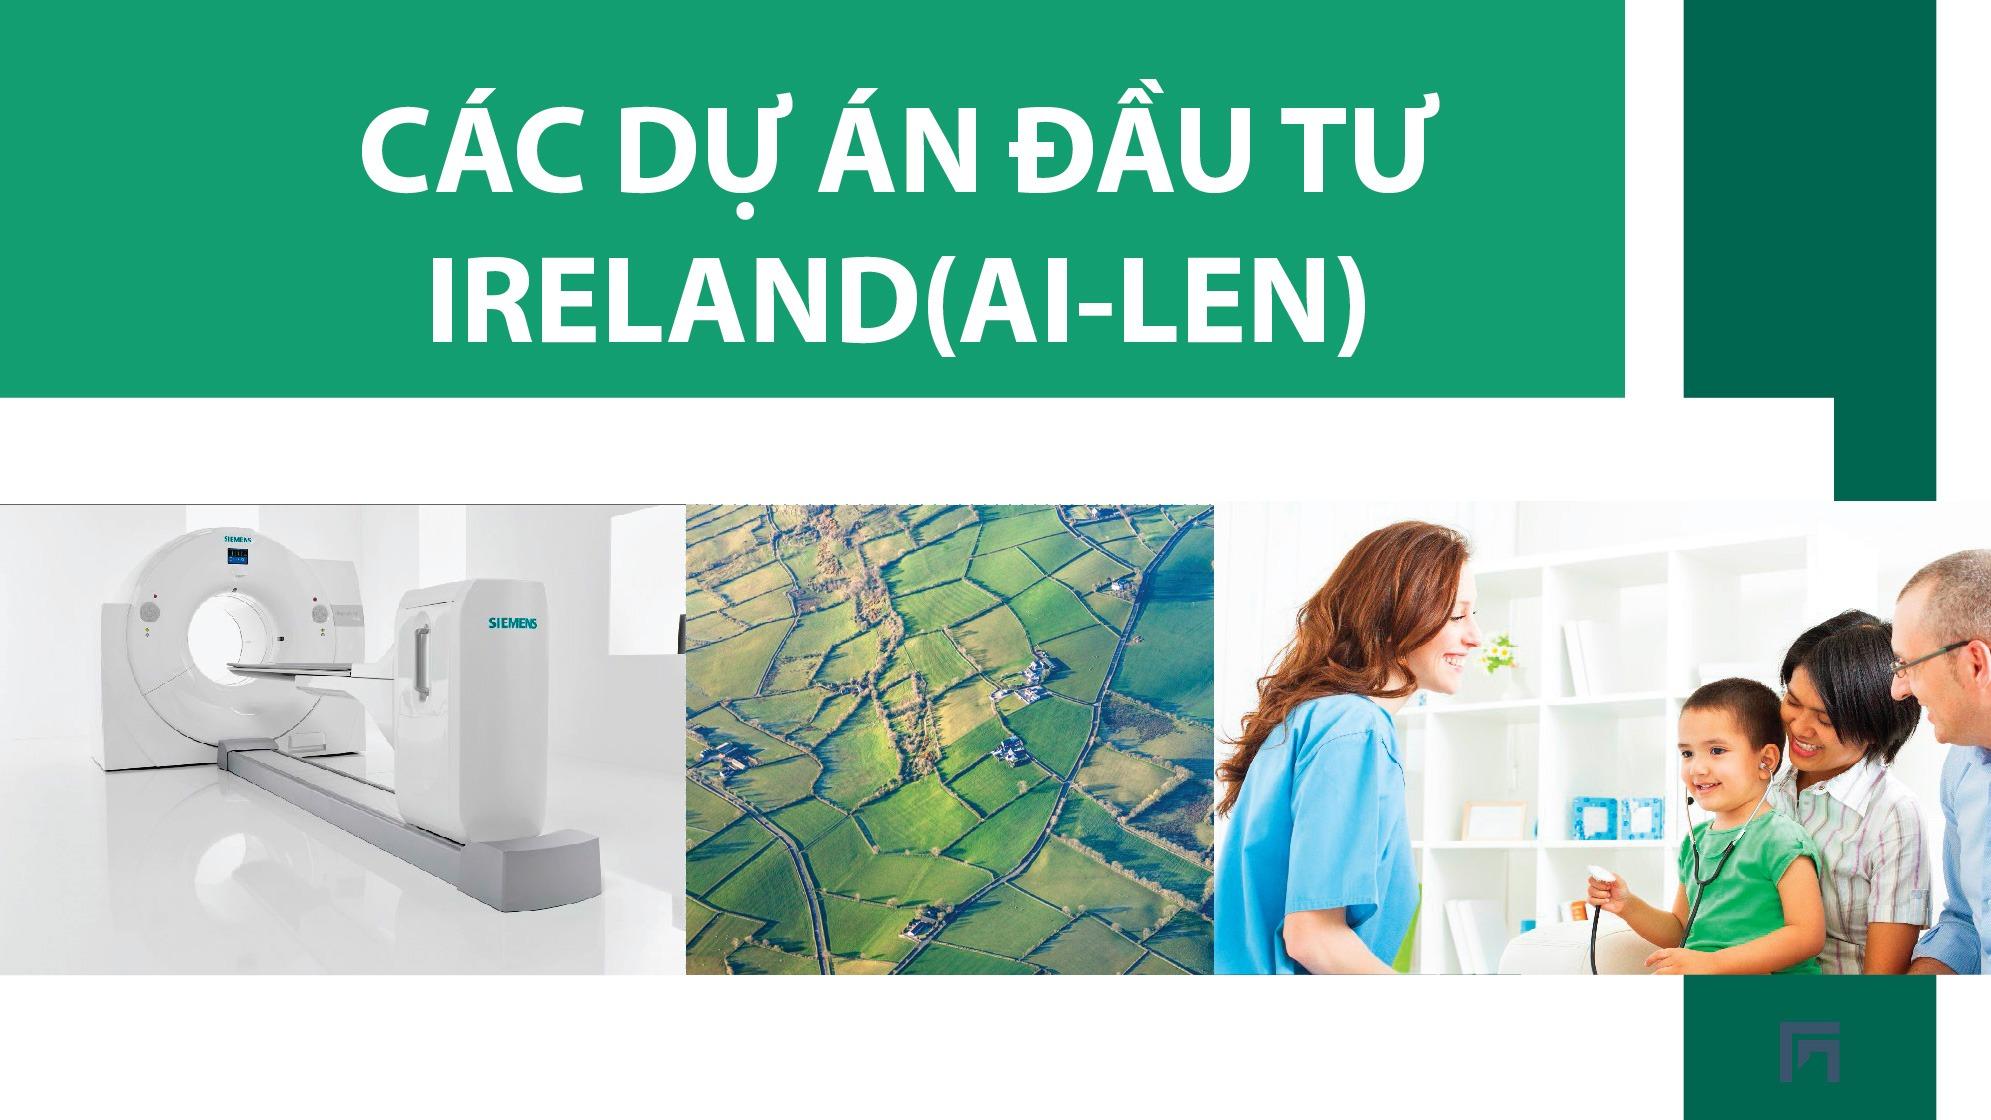 cac-du-an-dau-tu-dinh-cu-ireland